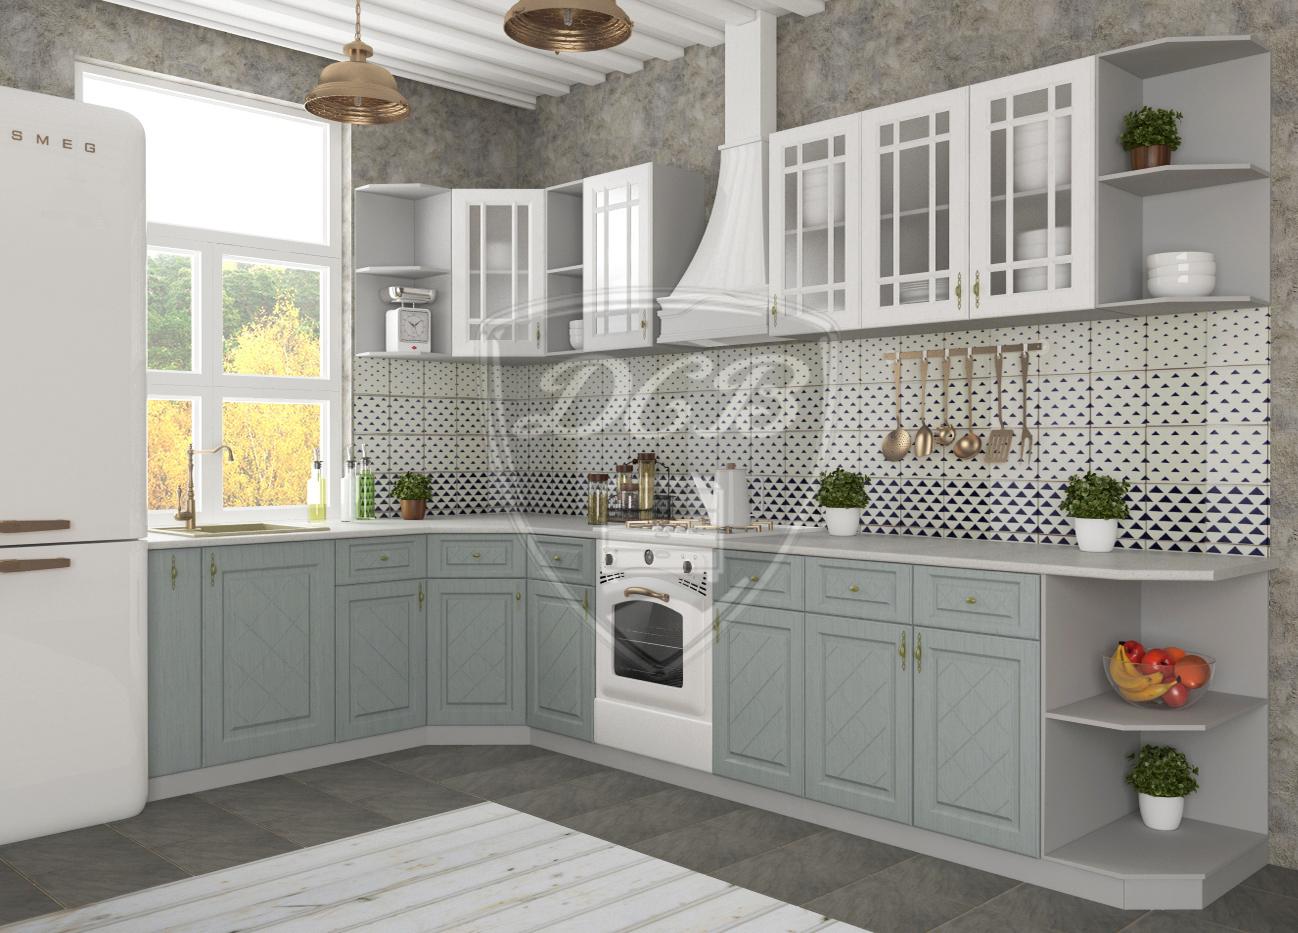 Кухня Гранд СТУ 300 Шкаф нижний полка угловая